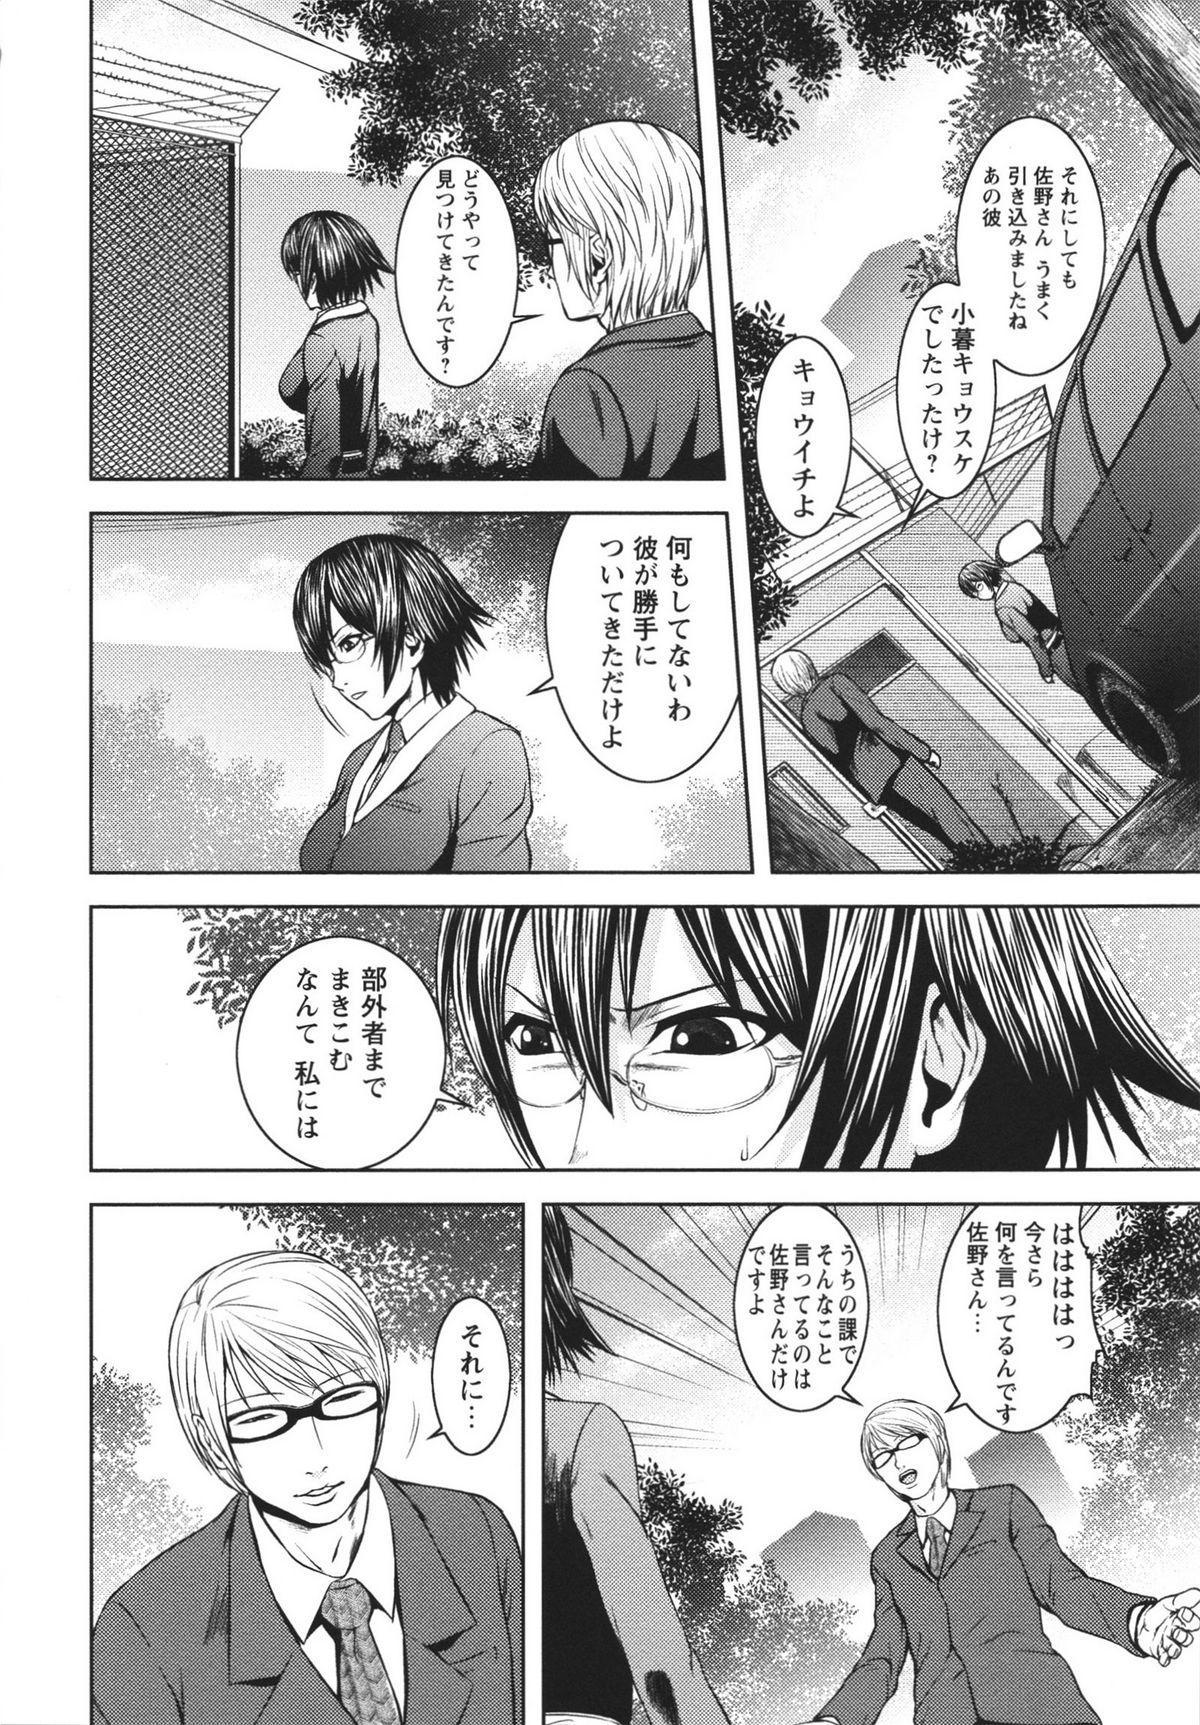 [Kawazuko Chouji] m7 -Minor Seven- Jou 121